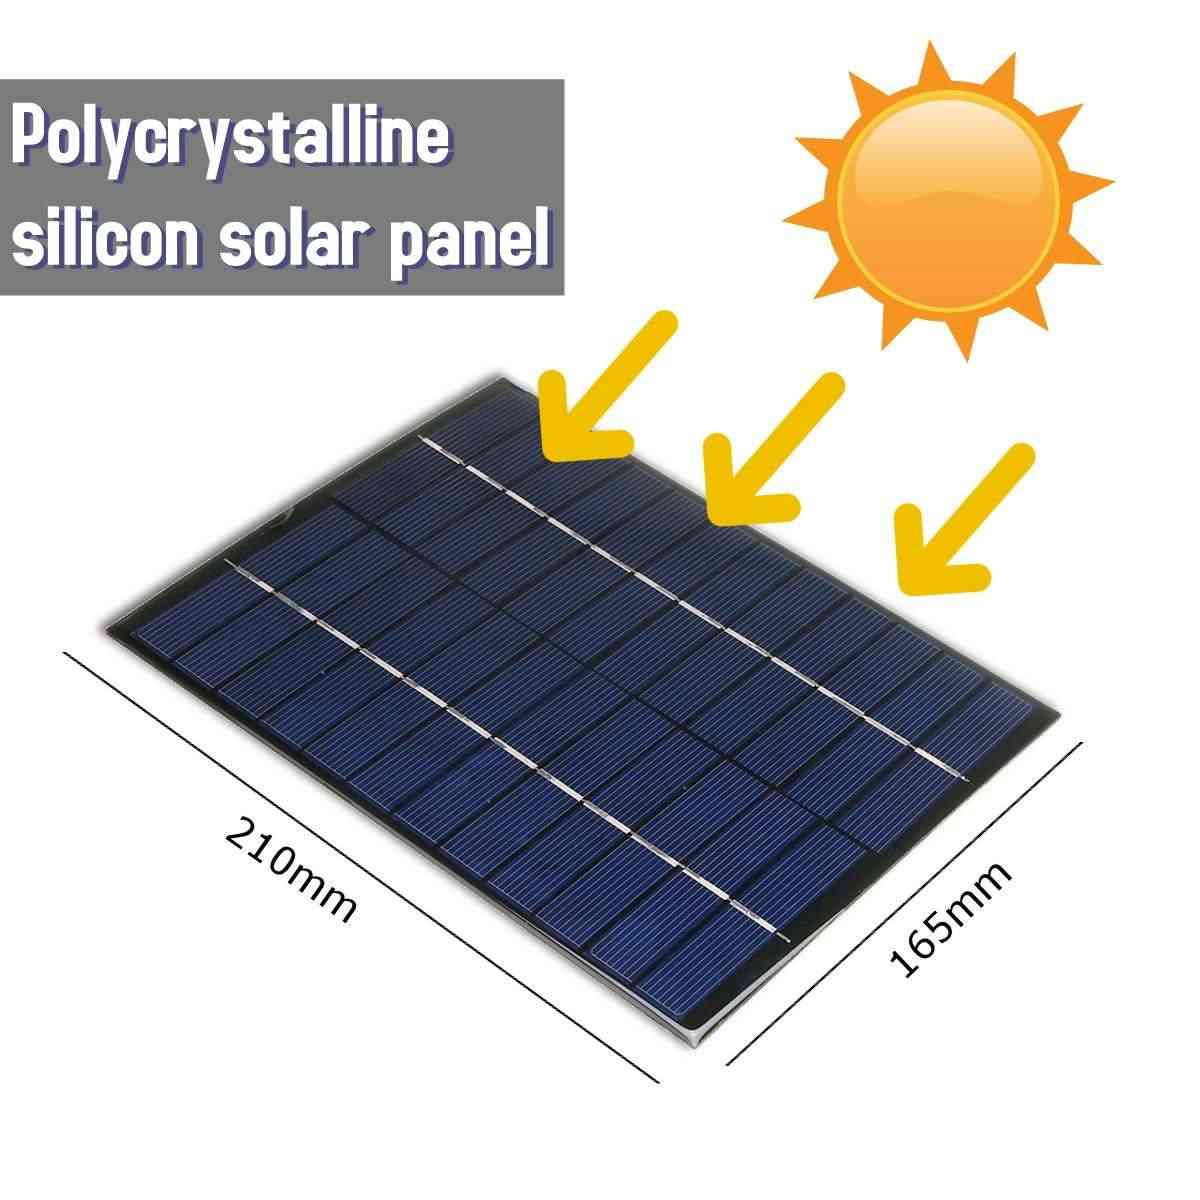 LEORY لوحة طاقة شمسية 12 V 5.2 W شاحن بالطاقة الشمسية 5 V شاحن بطارية هاتف محمول 12 V البسيطة DIY الايبوكسي الكريستالات الخلايا للالهاتف المحمول